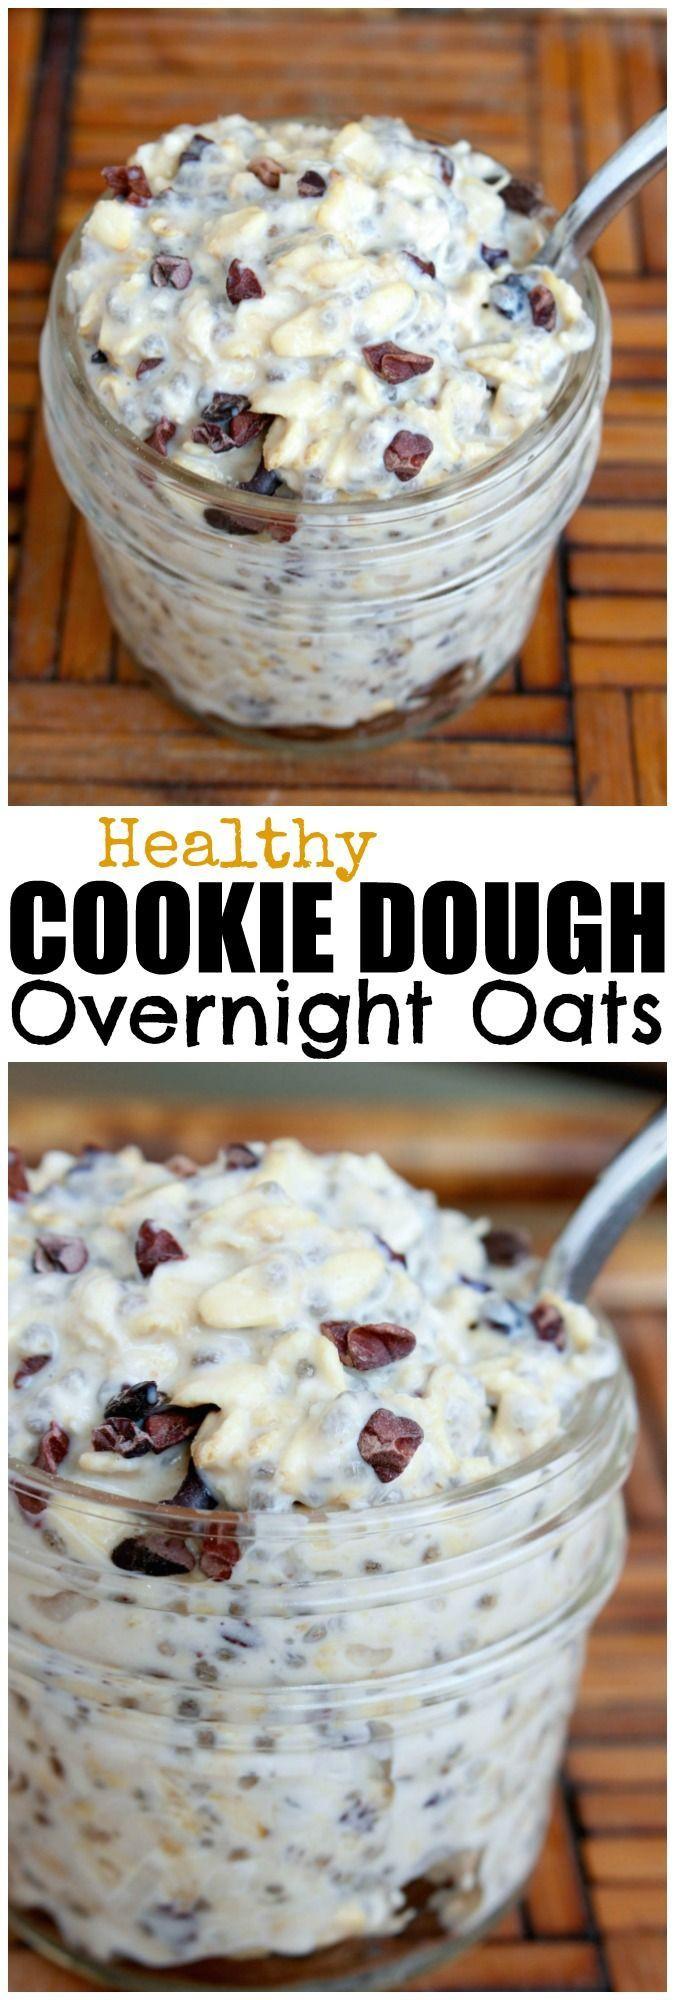 Healthy Overnight Oats Recipe  Best 25 Healthy overnight oats ideas on Pinterest